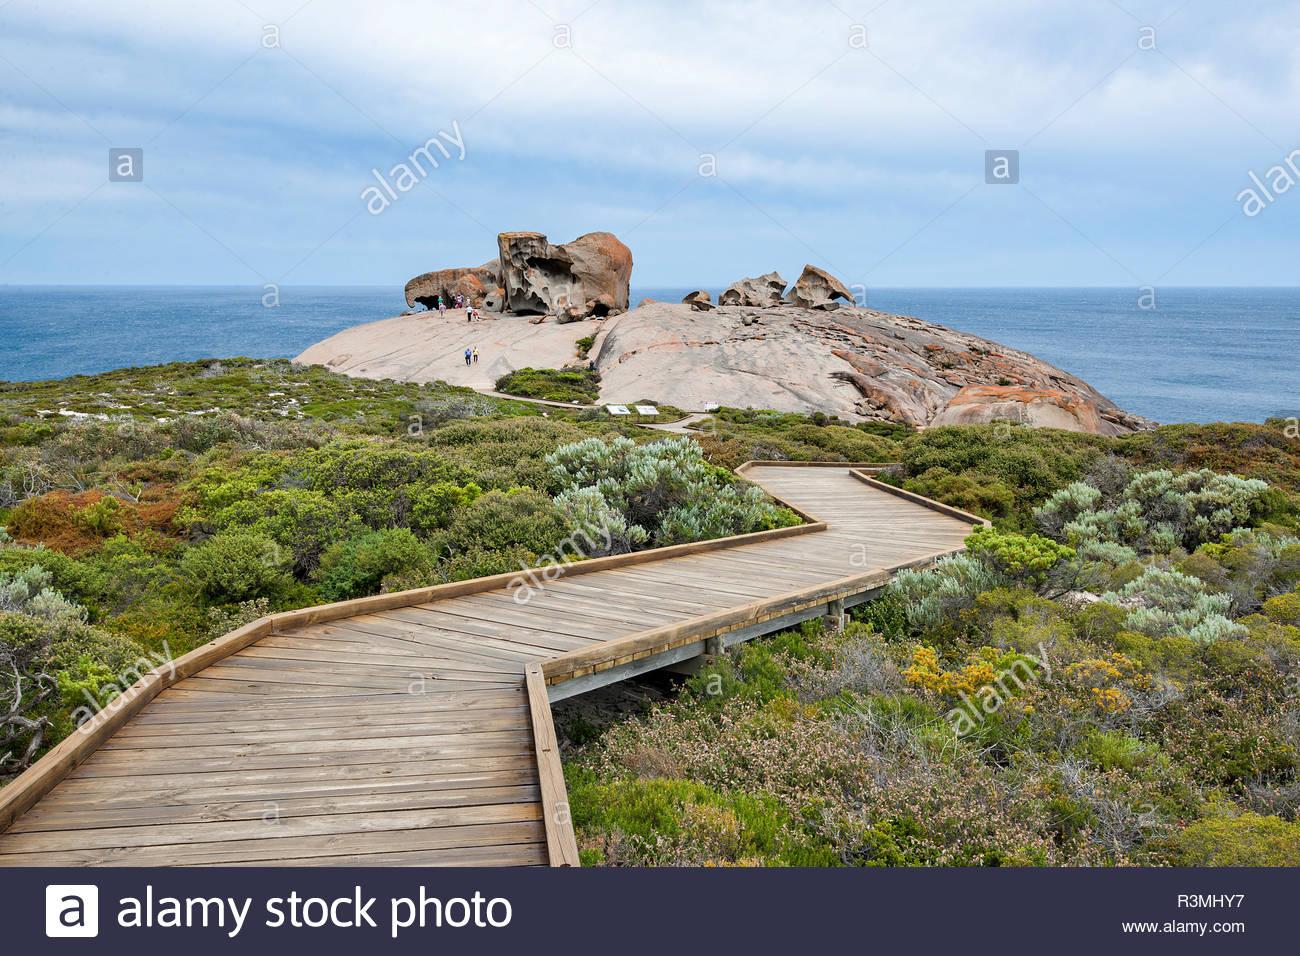 Remarkable rocks in the Flinders National Park Chase, Kangaroo island, South Australia Stock Photo